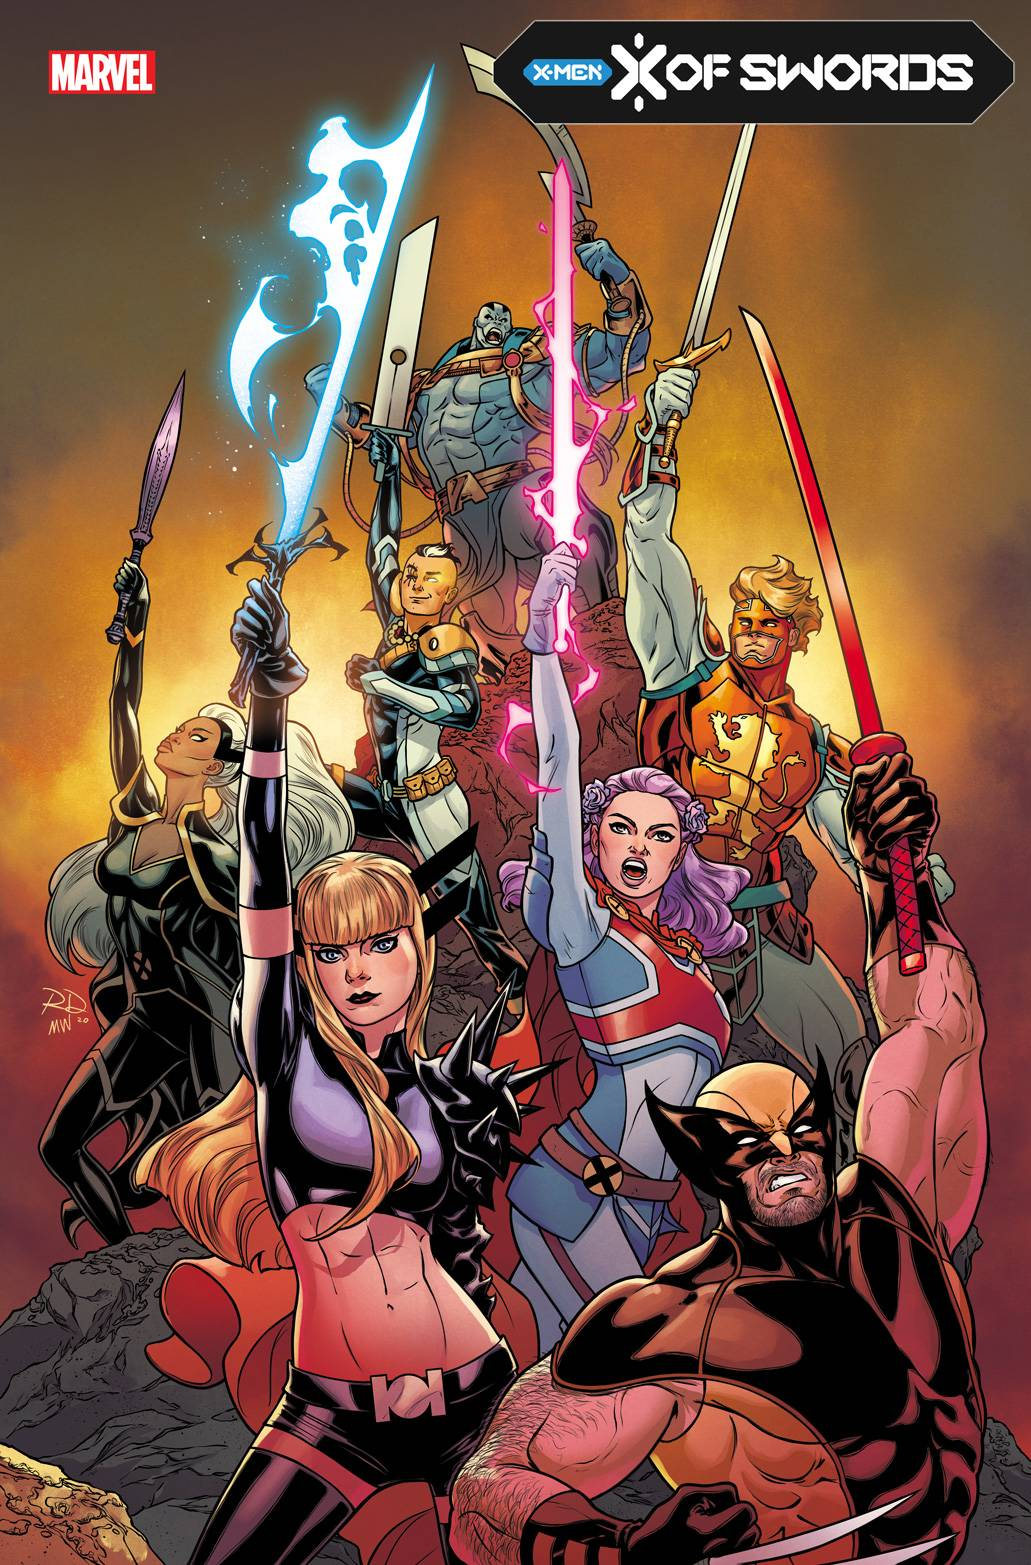 X-Men X of Swords event: story, cast, checklist, and everything else we  know | GamesRadar+